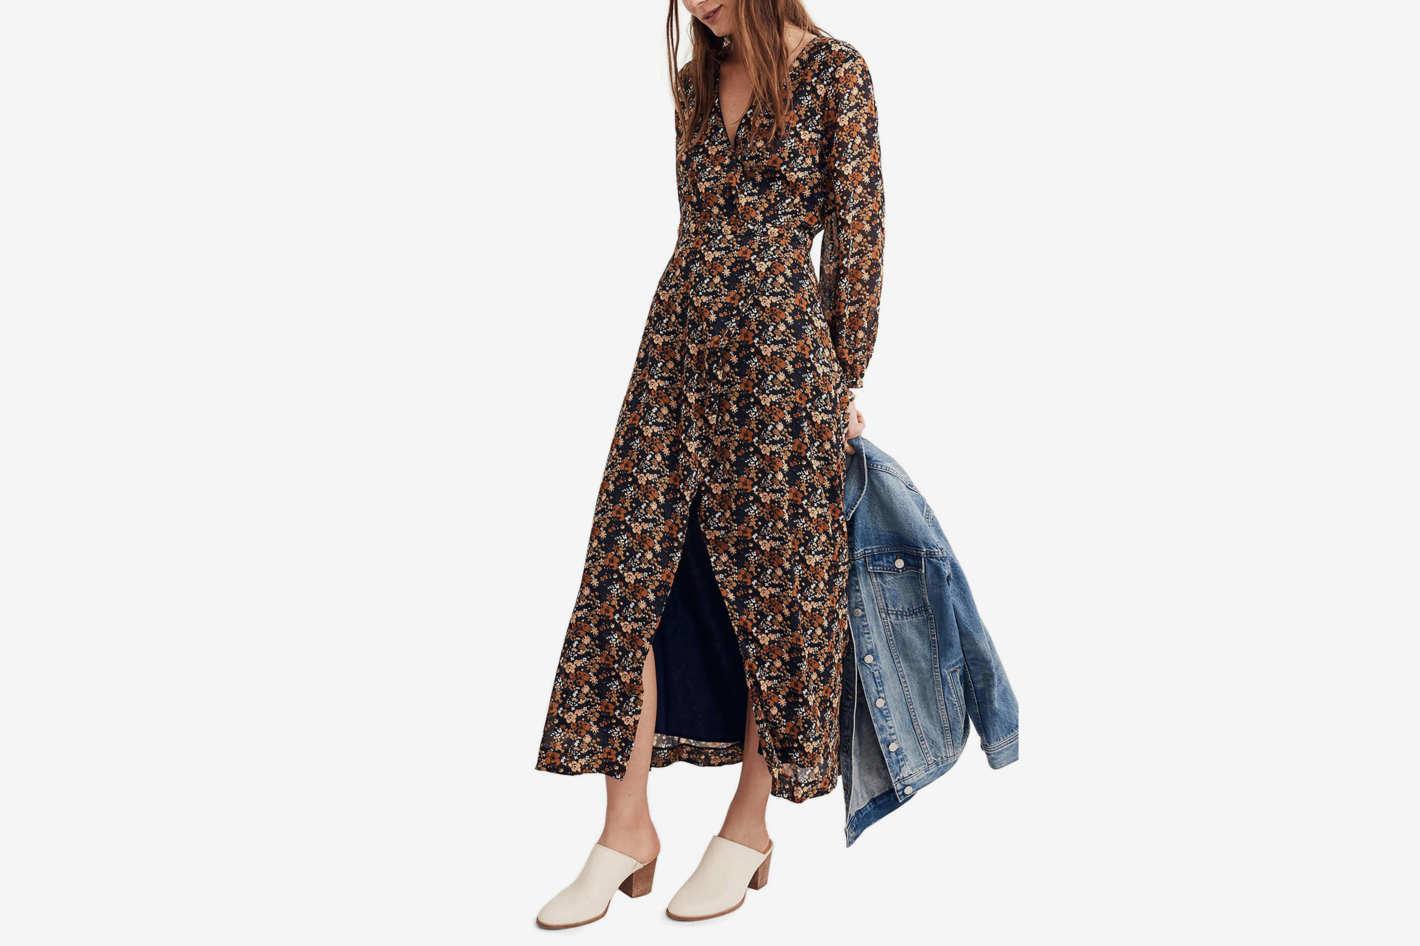 Madewell Nightflower Maxi Dress